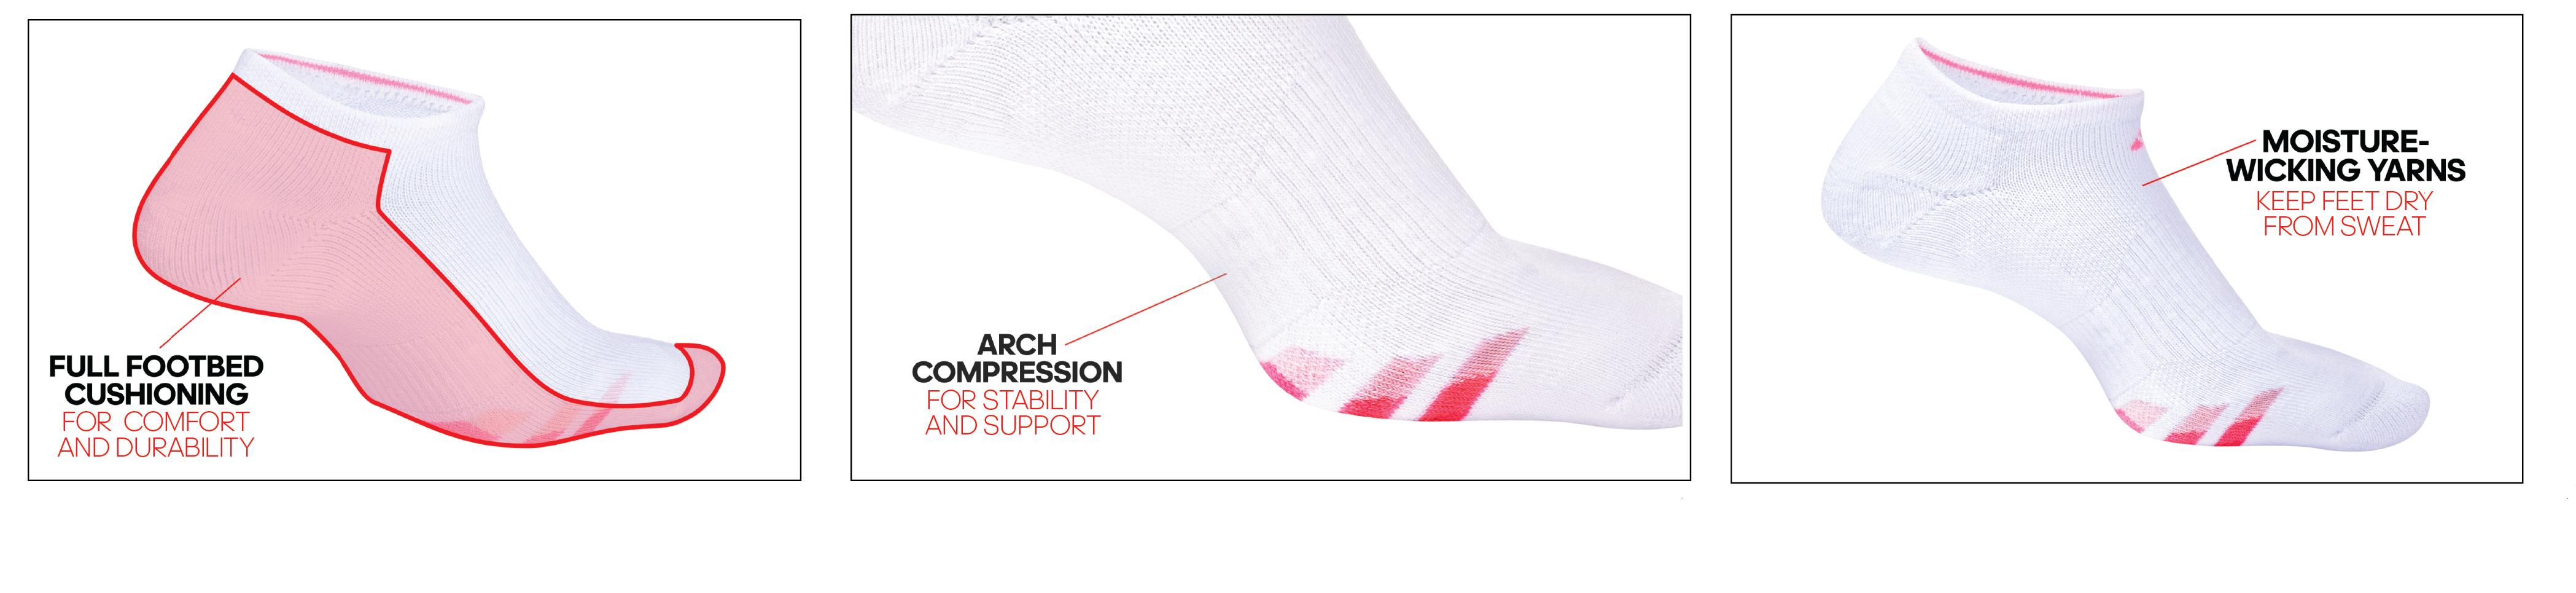 af5704015a61f0 adidas Women s Cushioned Low Cut Socks (3-Pack)